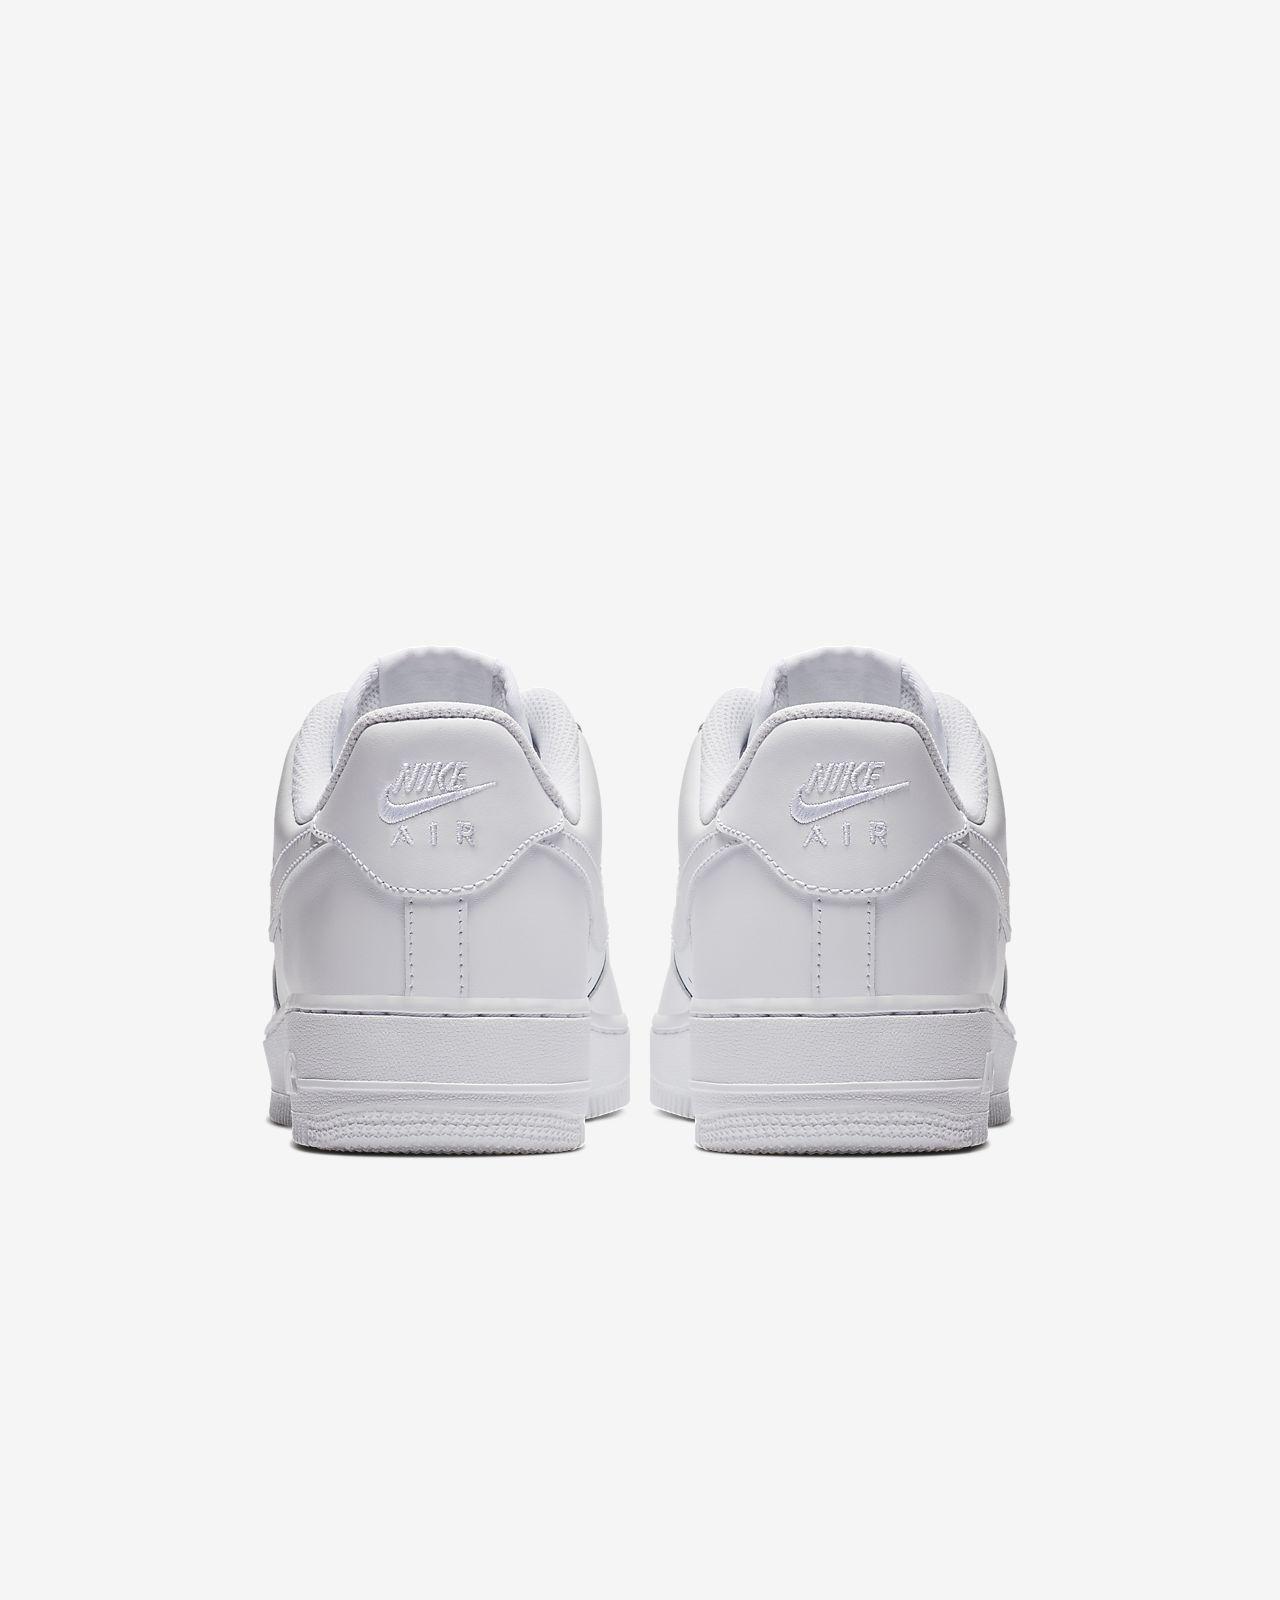 Nike Air Force 1 ''07 07 all white ab 96,95 € (Juli 2020